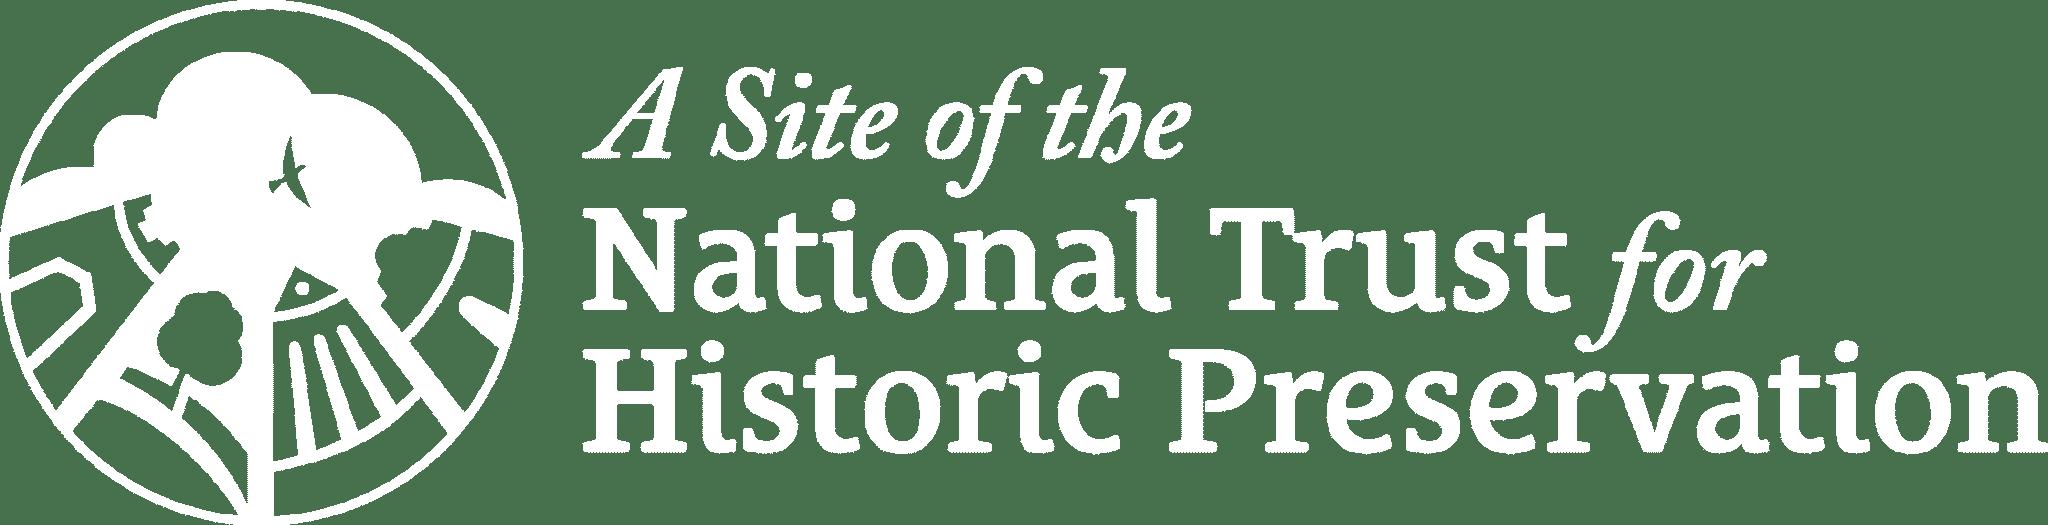 NTHP Logo White